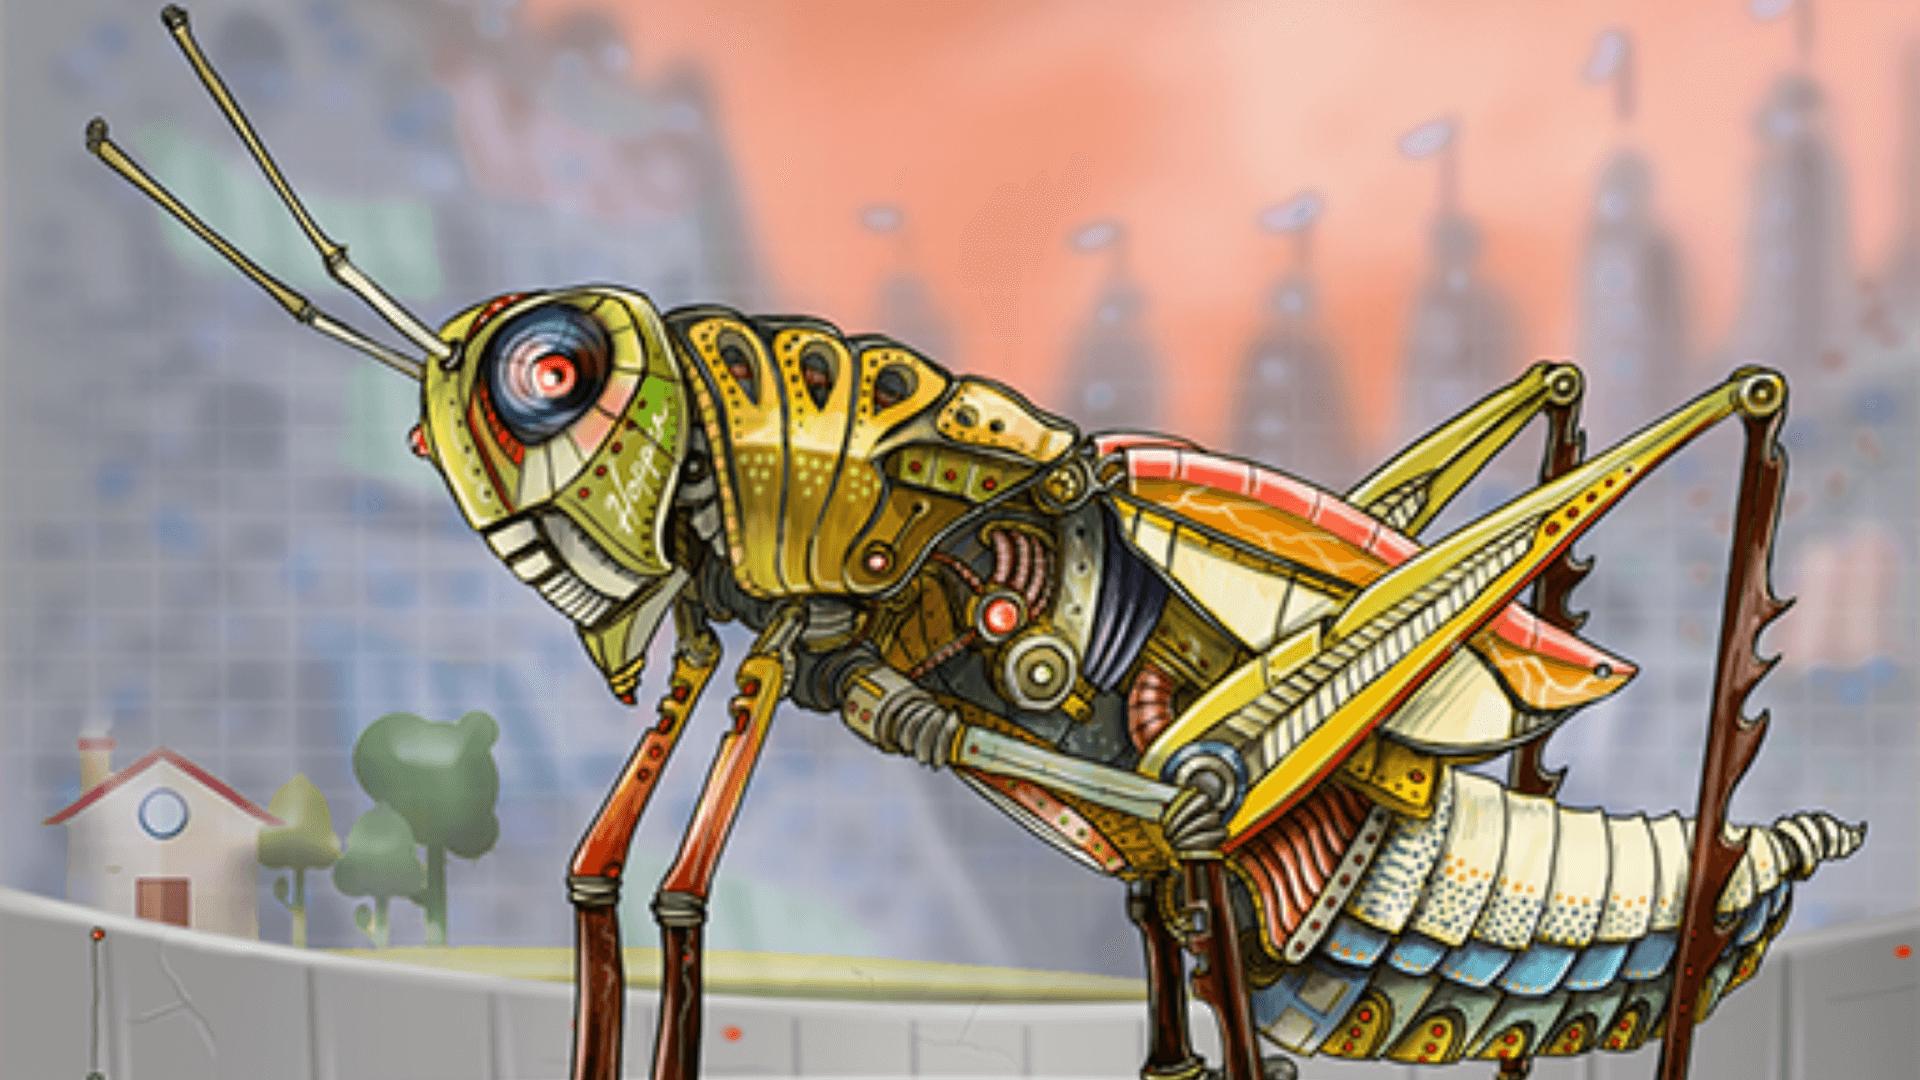 Grasshopper Farm & Ether Legends Collaboration